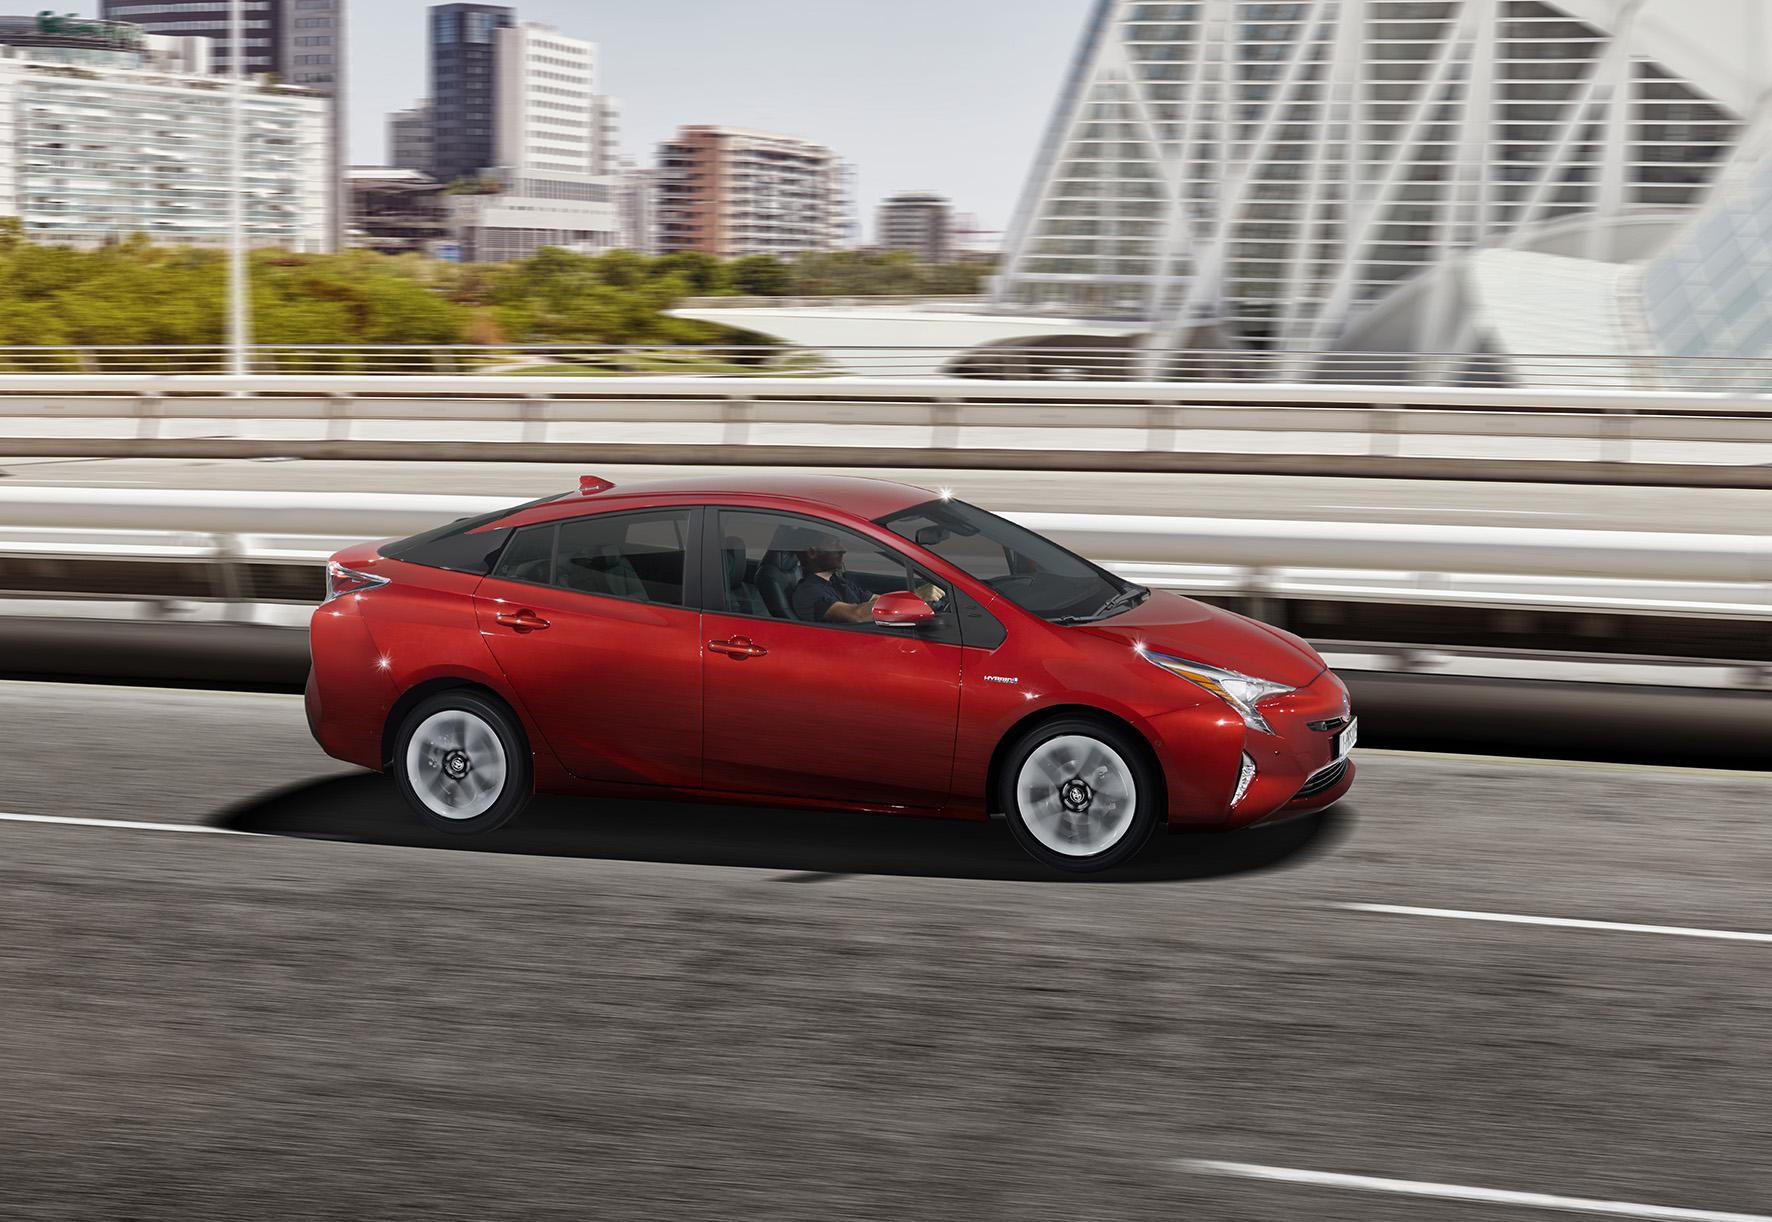 Toyota-Prius-september-2015-18